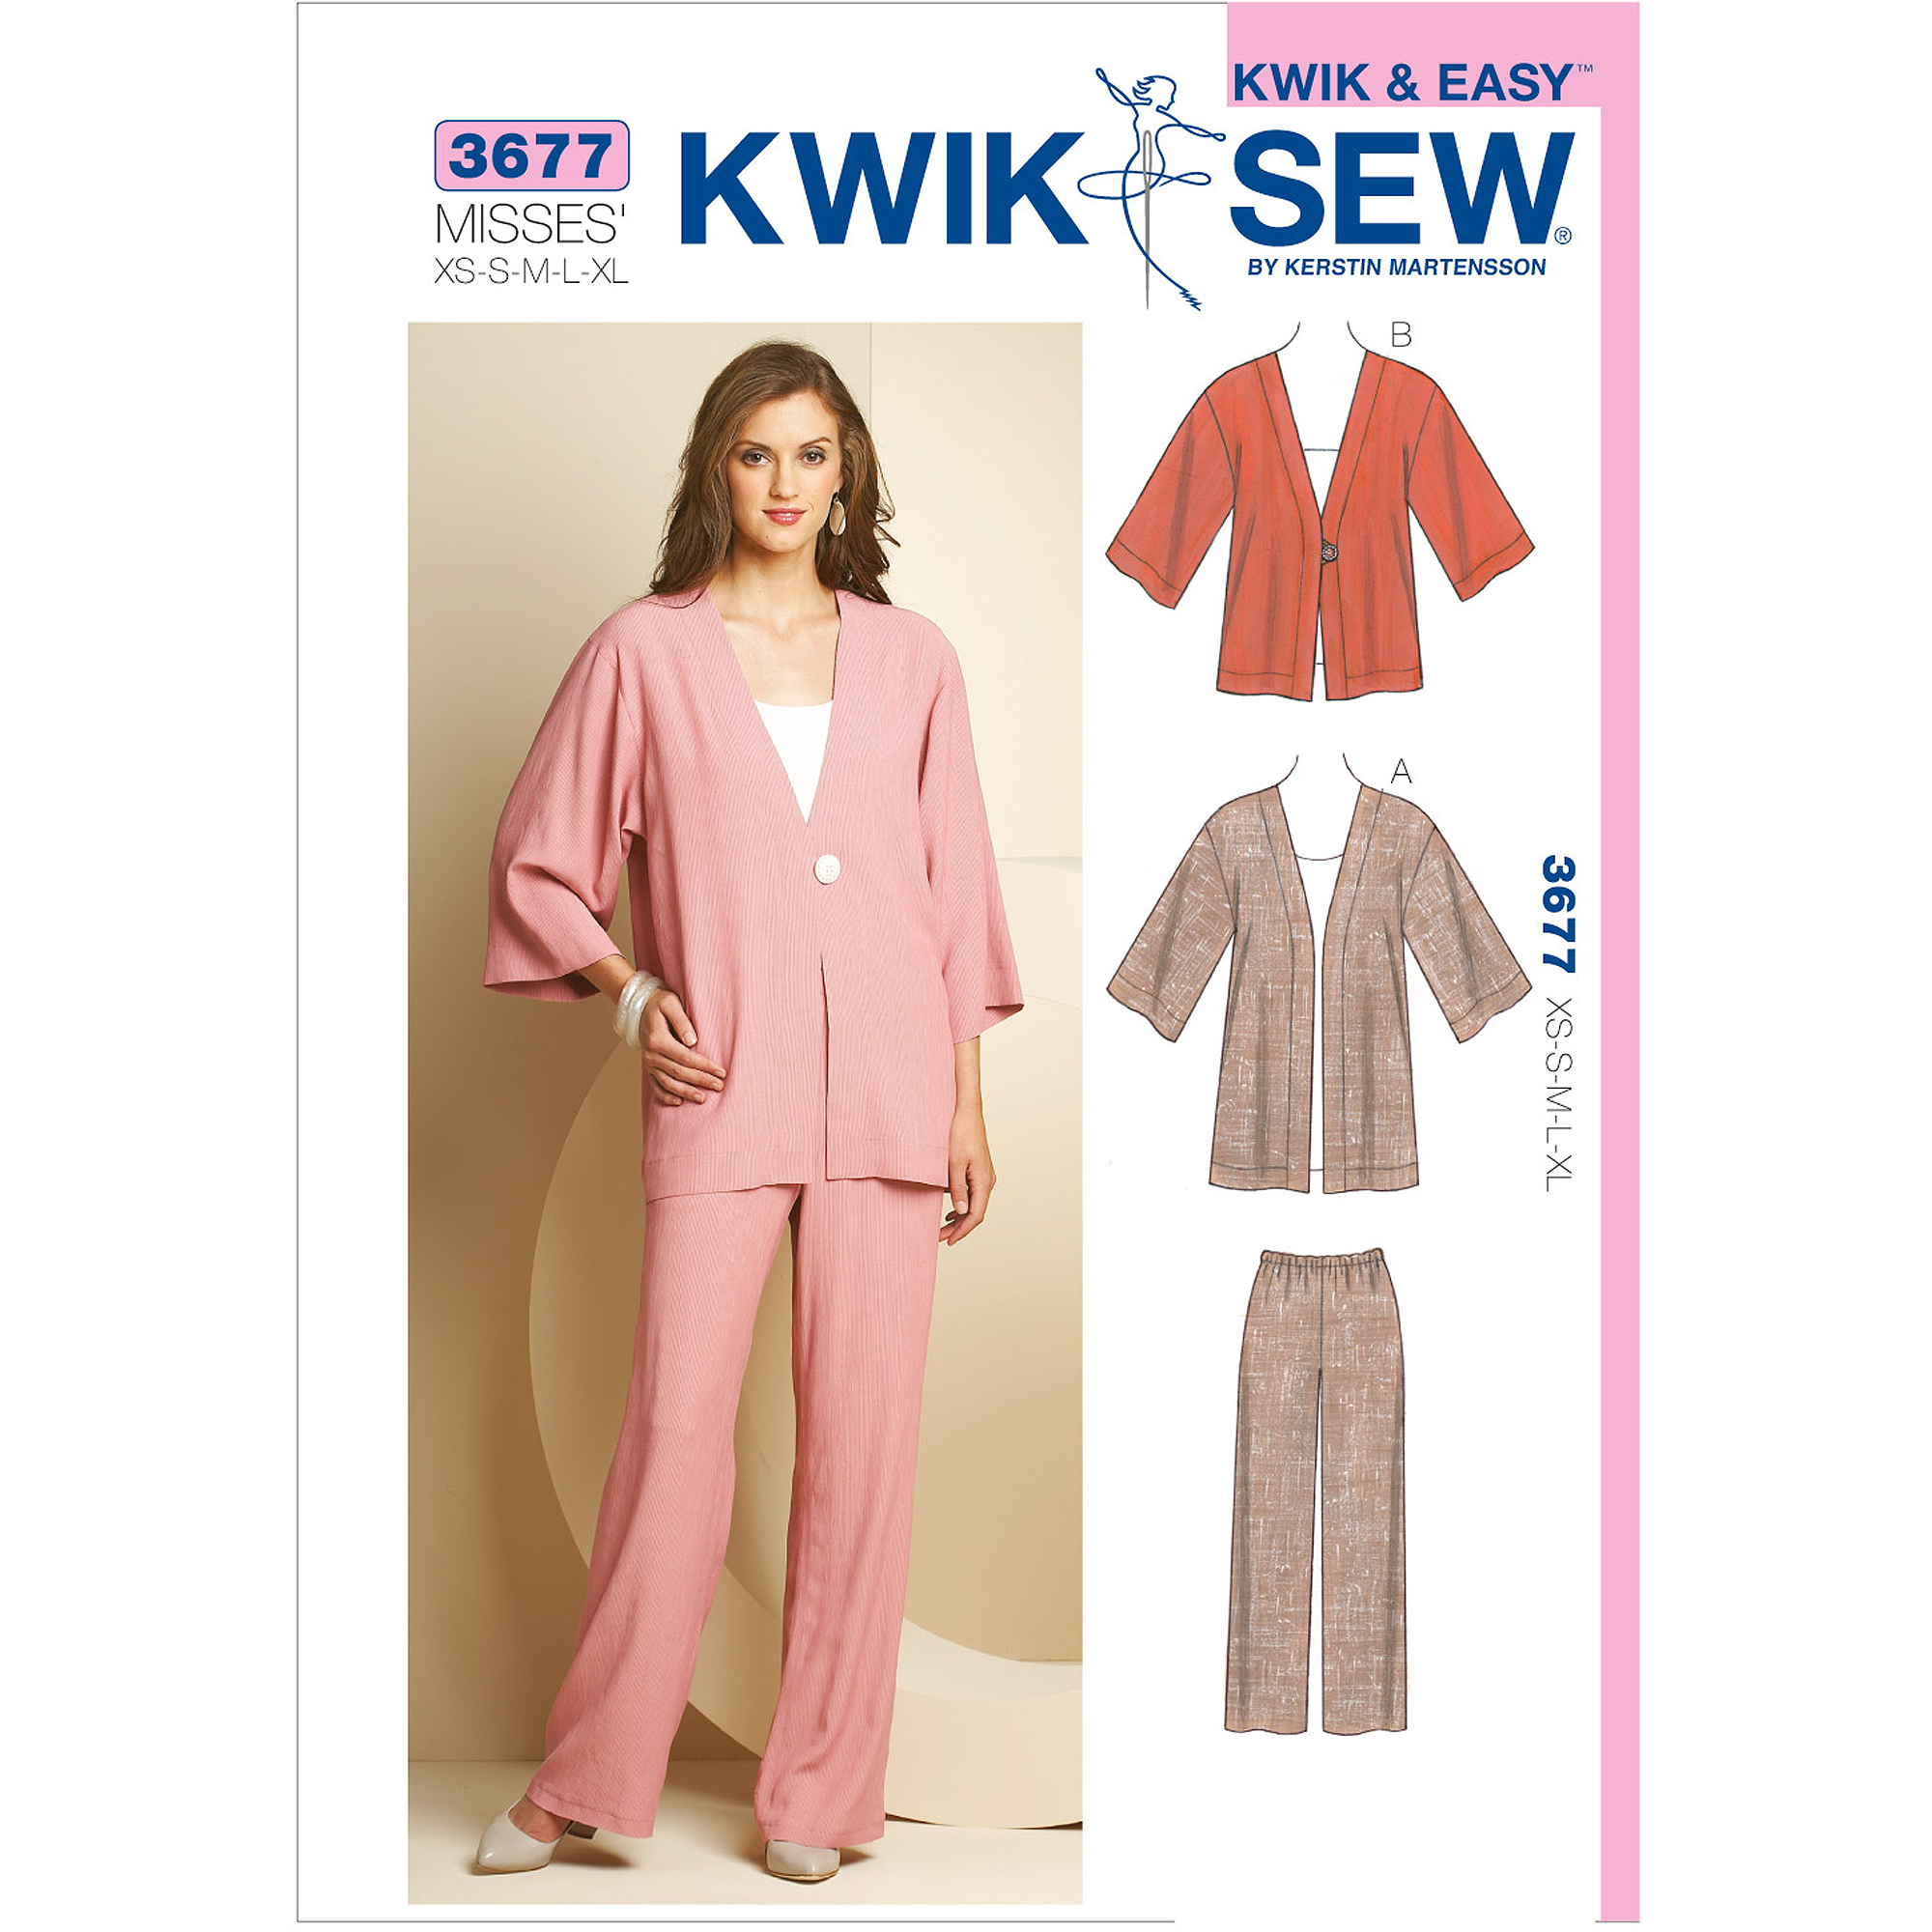 Kwik Sew Pattern Jackets and Pants, (XS, S, M, L, XL)